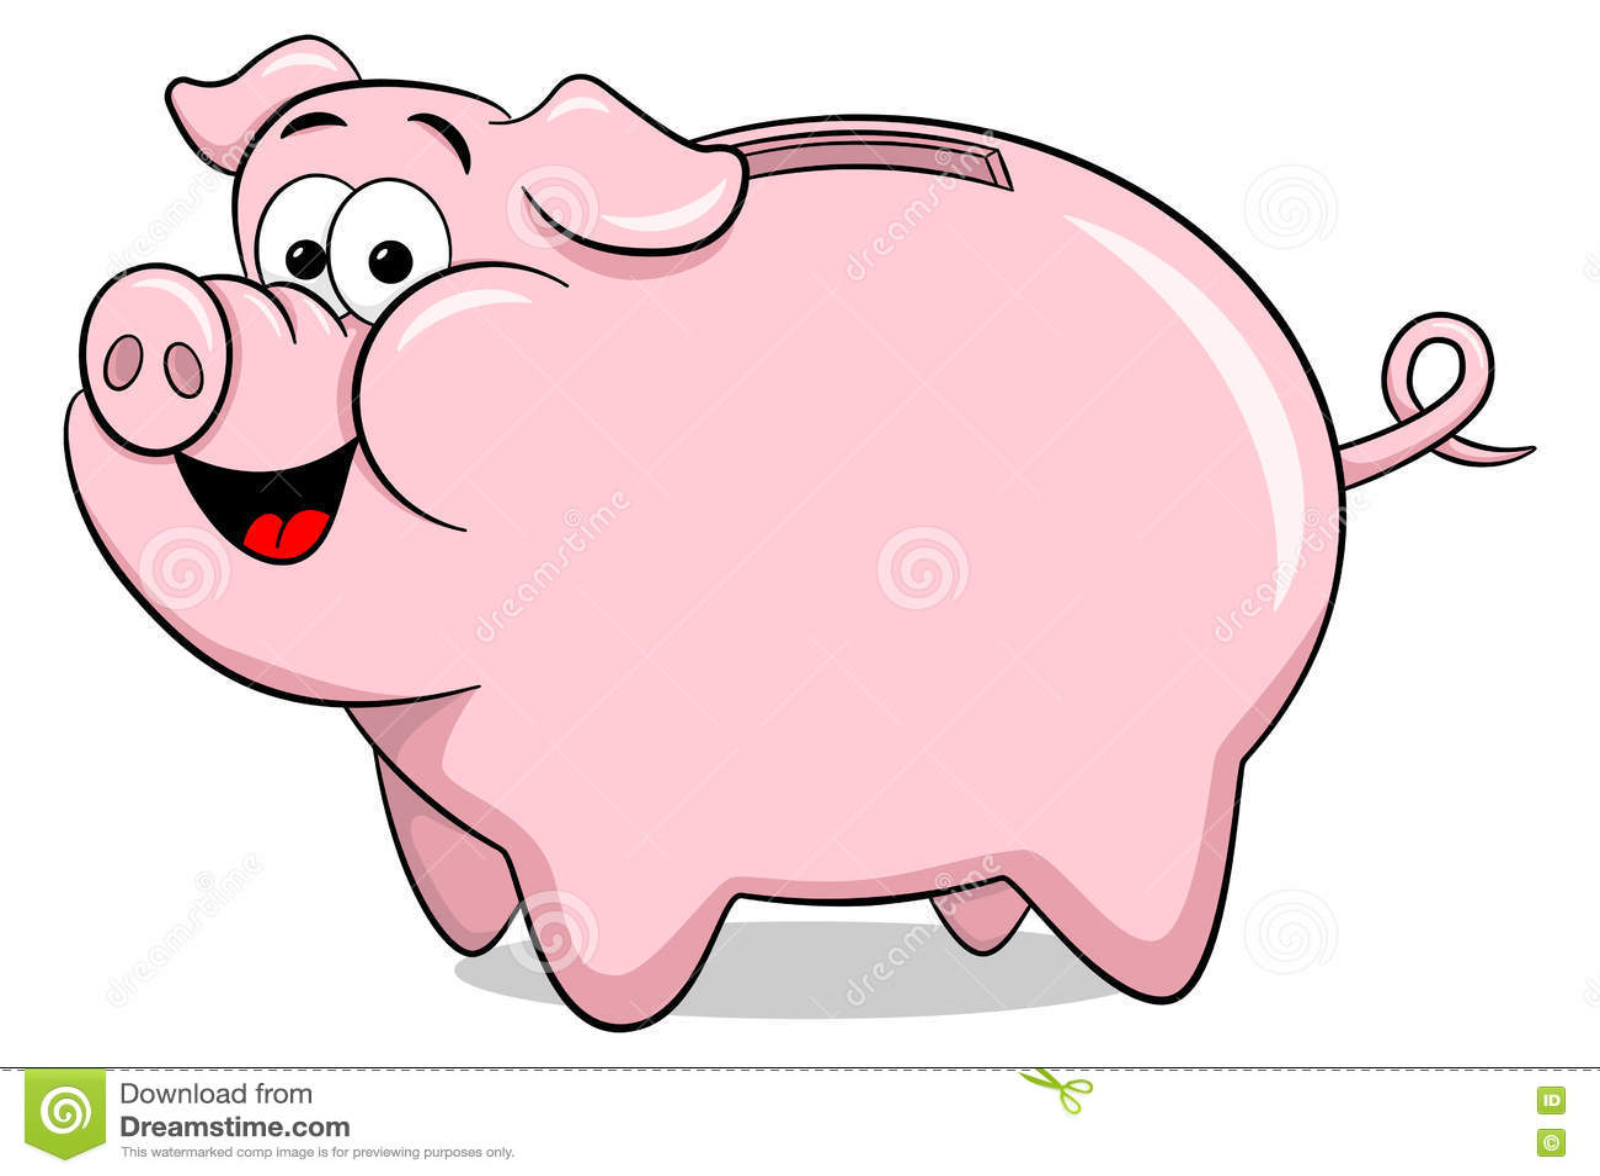 Cartoon Piggy Bank Stock Vector